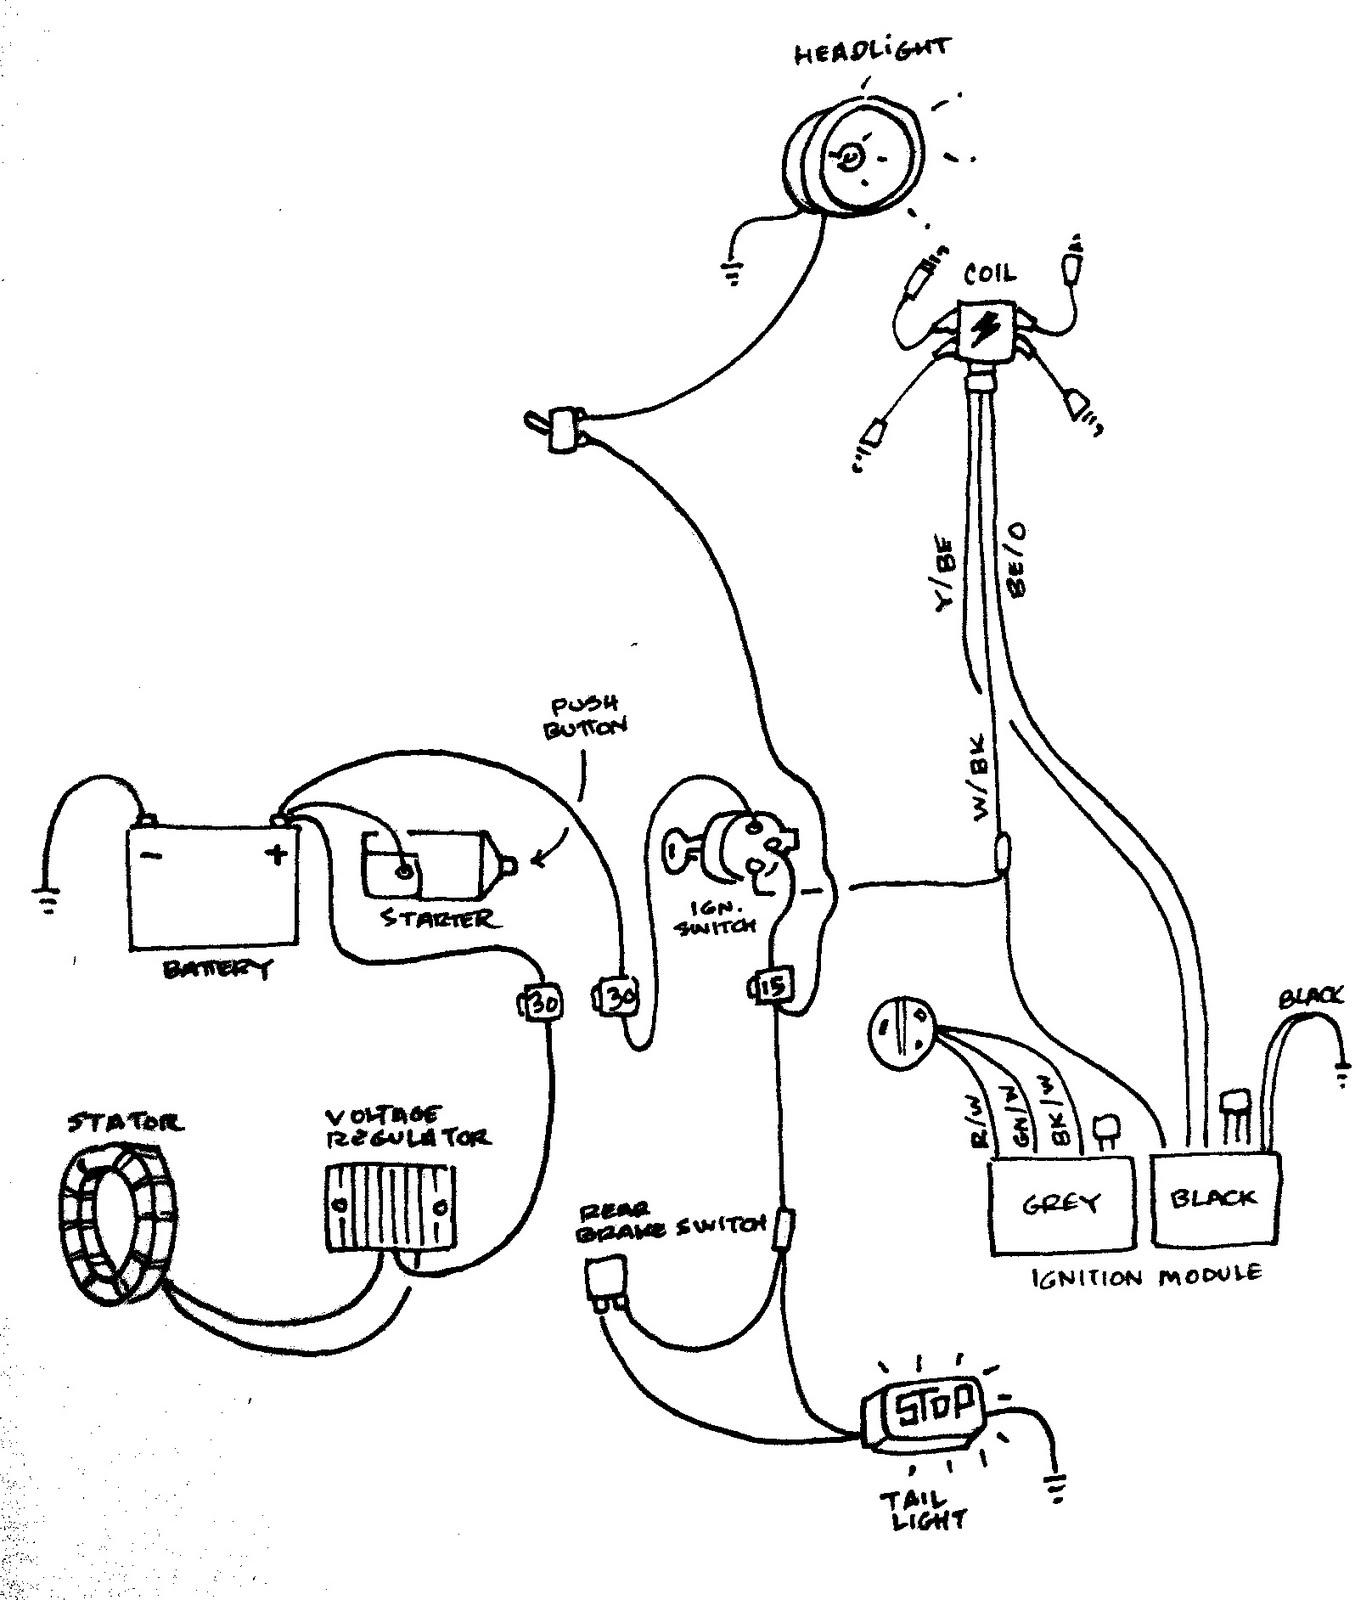 Enchanting Baja 50cc Atv Wiring Diagram Vignette - Electrical and ...